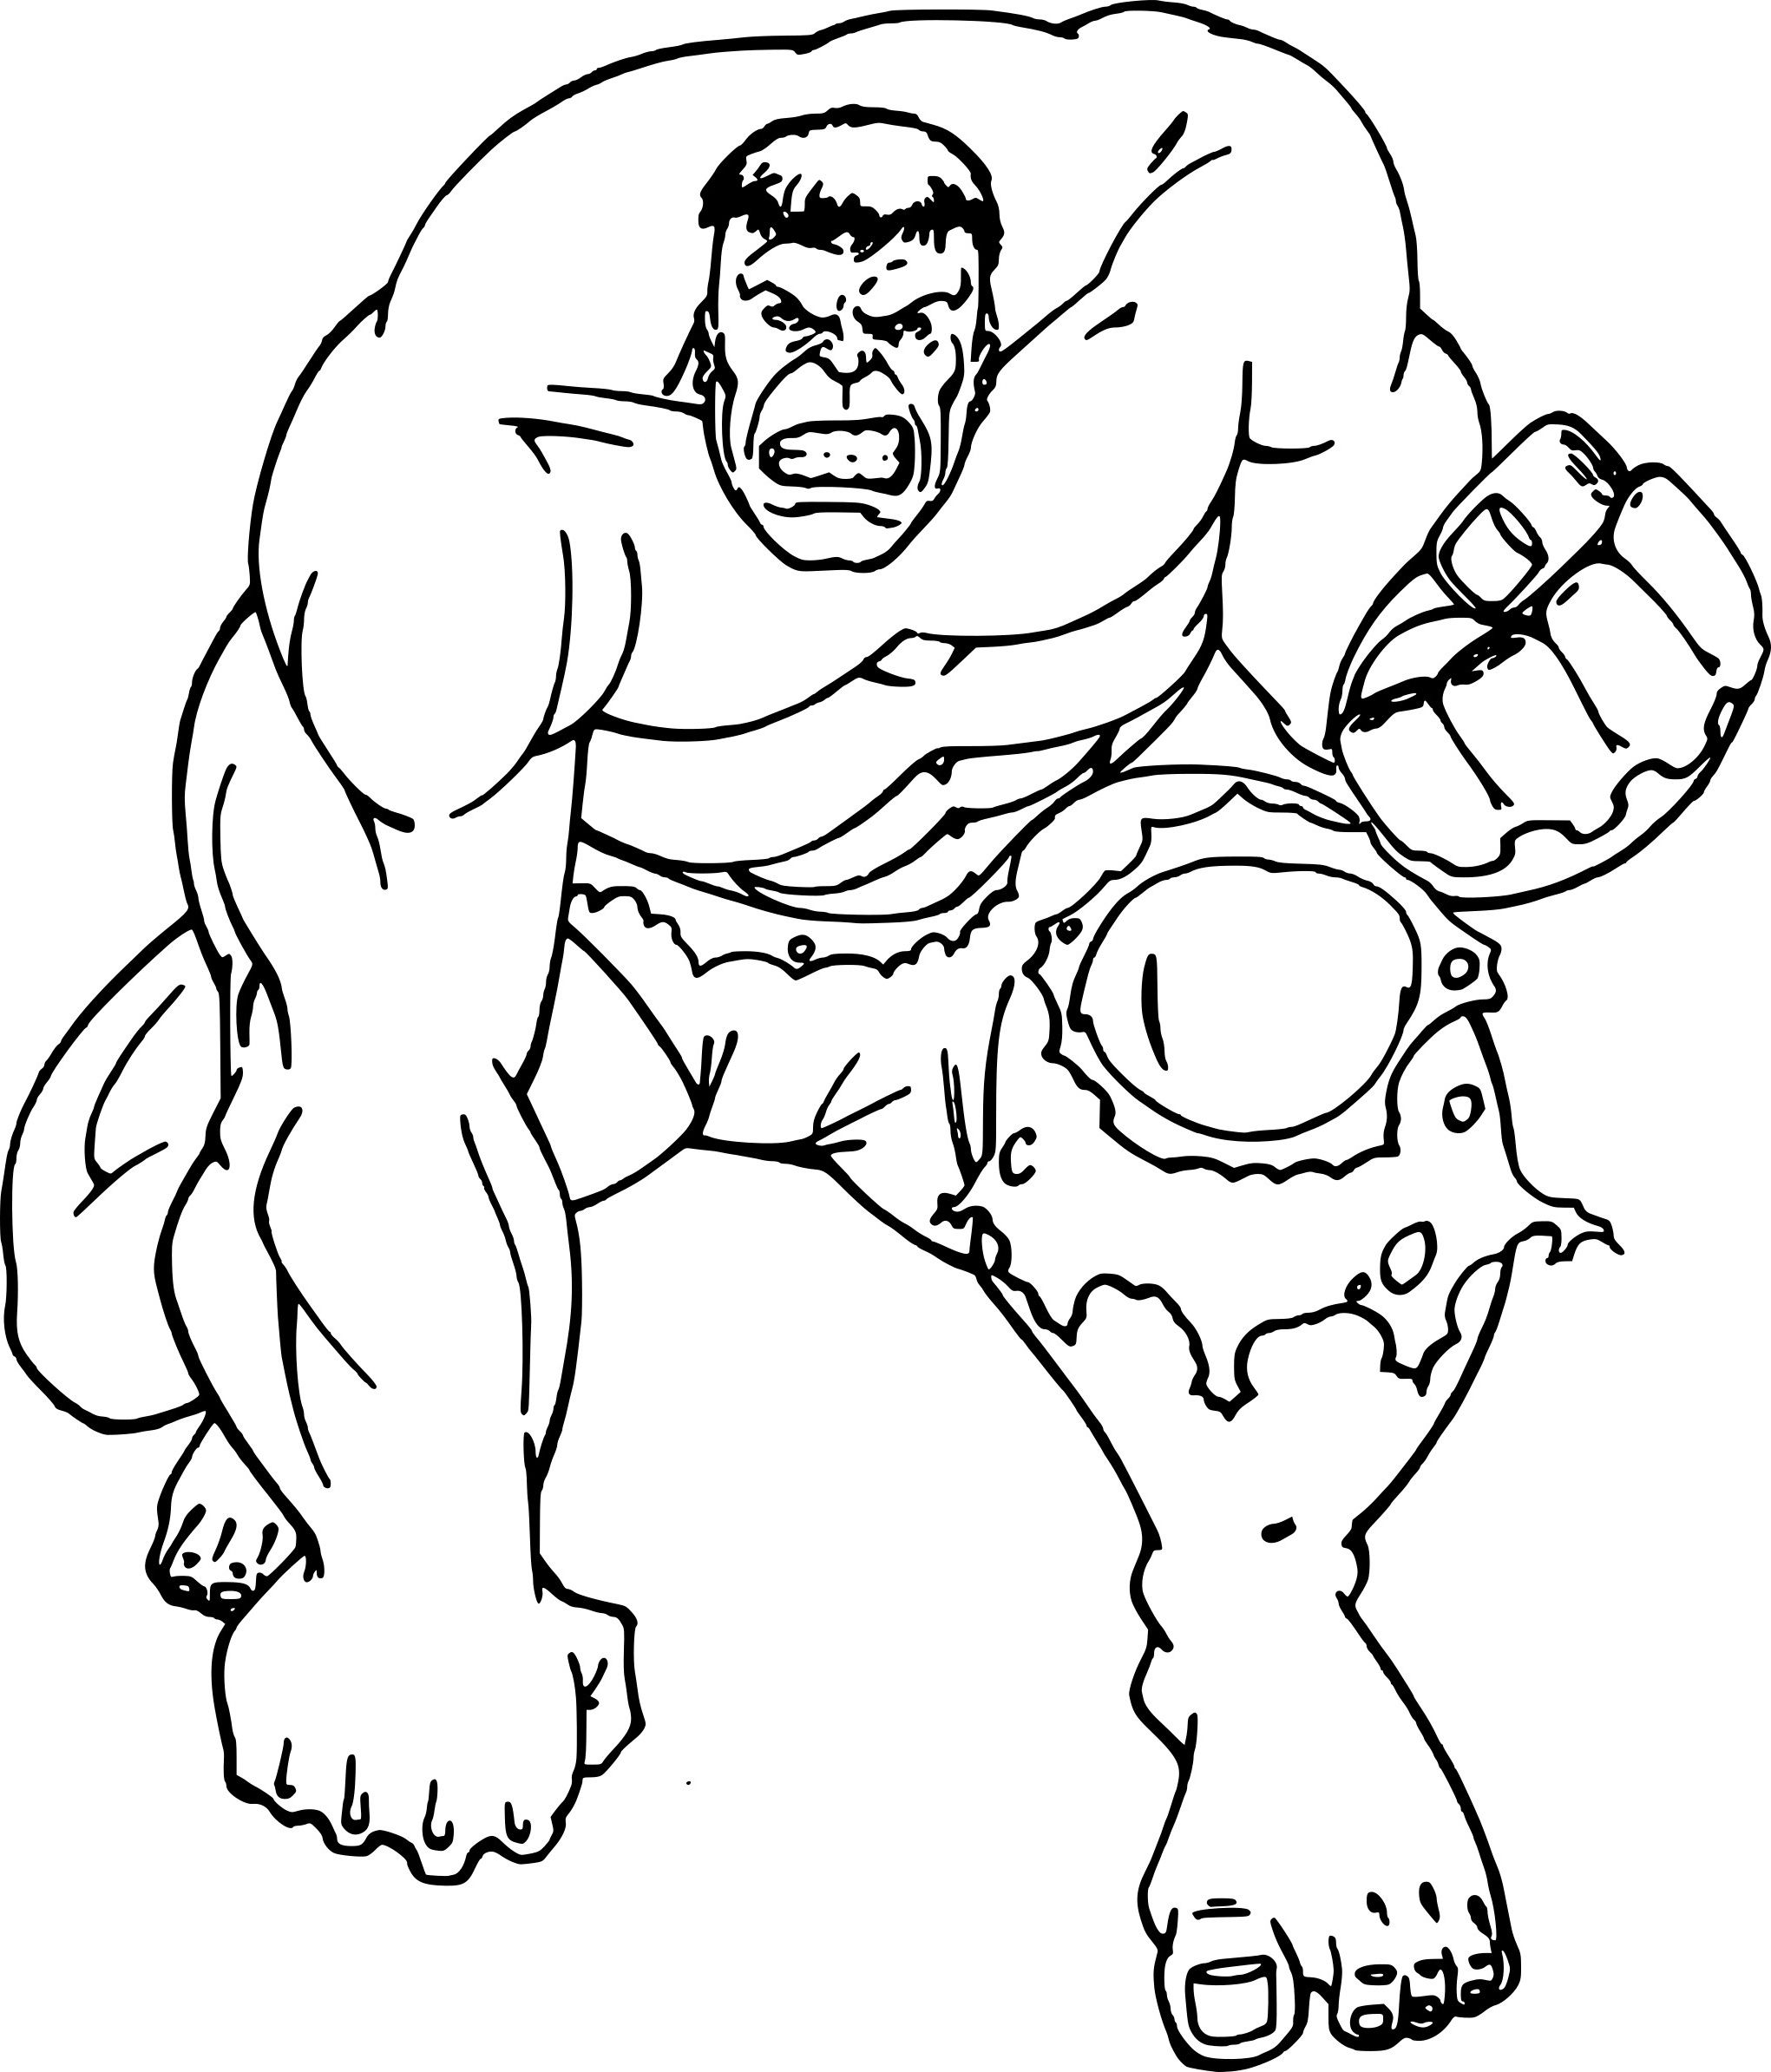 Dessin A Colorier Gratuit Hulk - Free To Print